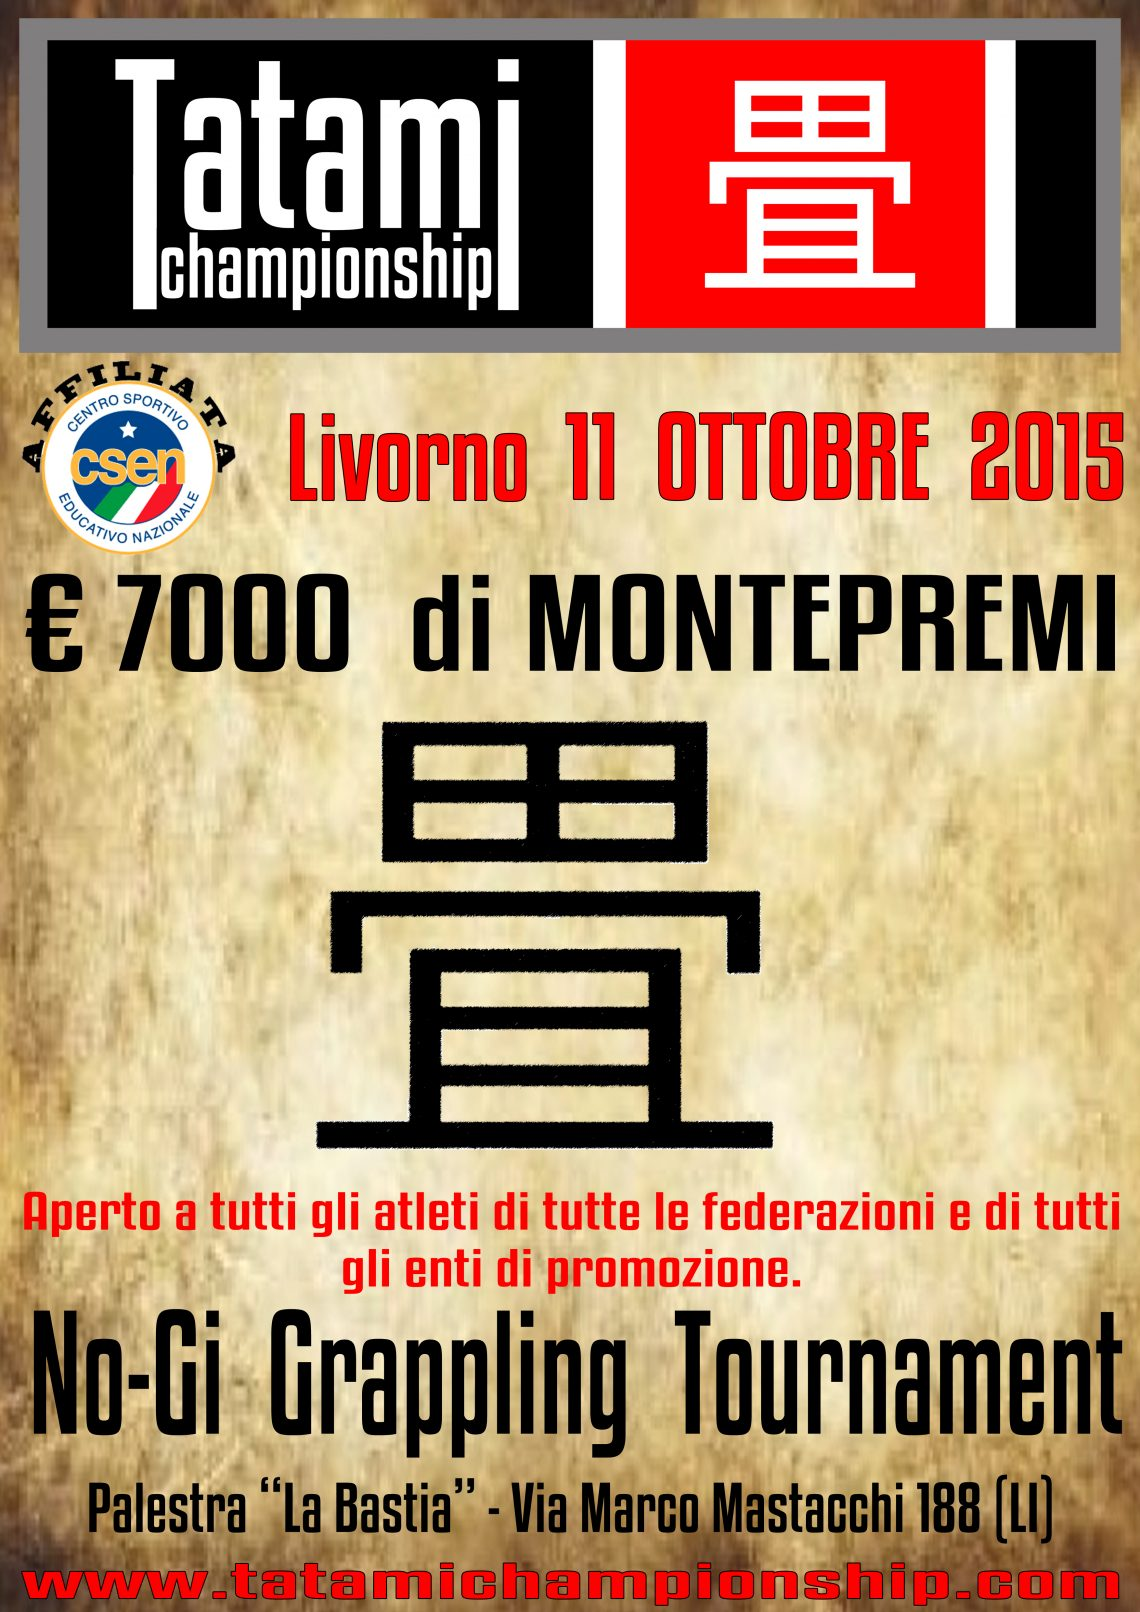 Tatami Championship (No Gi a Livorno) 1